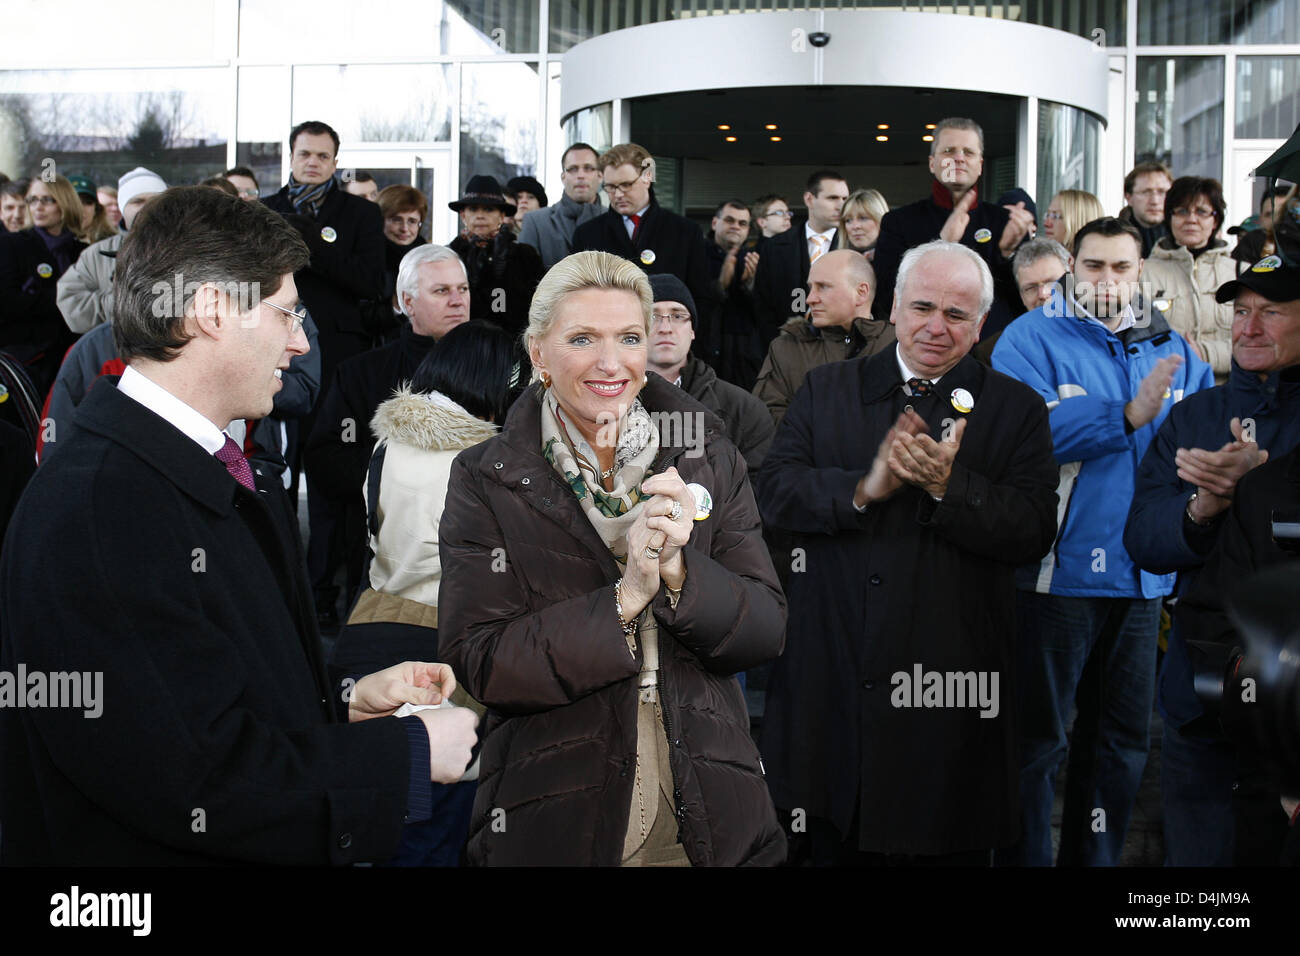 Maria-Elisabeth Schaeffler (C), owner of auto supplier Schaeffler Group, welcomes demonstrators at the plant gate - Stock Image